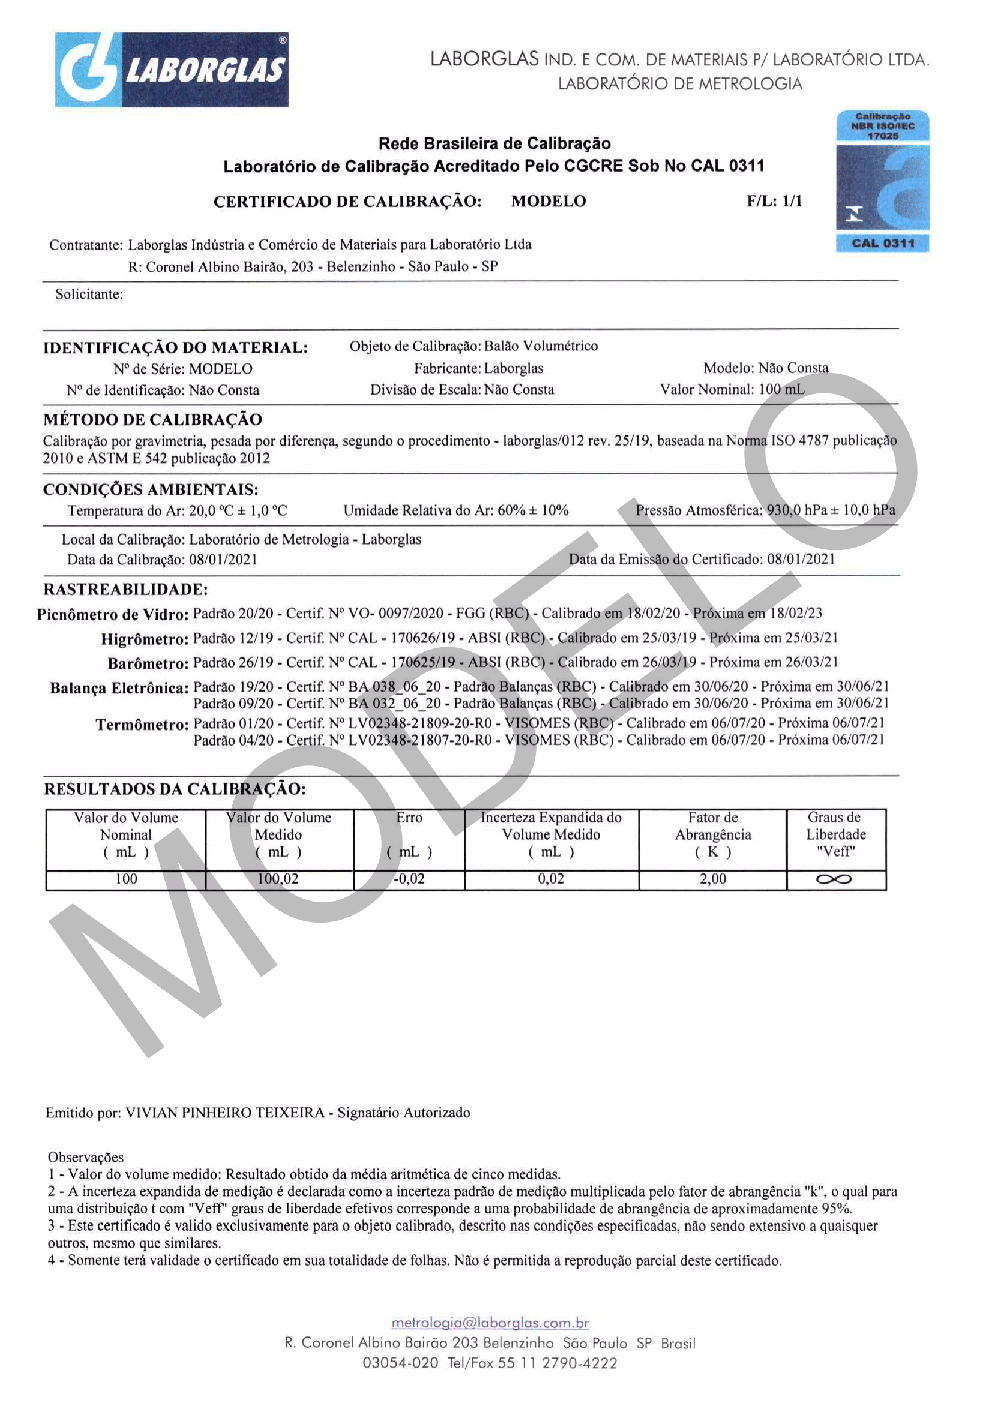 BALÃO VOLUMÉTRICO CLASSE A ROLHA POLI C/ CERTIFICADO  RBC 900 ML - Marca Laborglas - Cód. 9167853-R